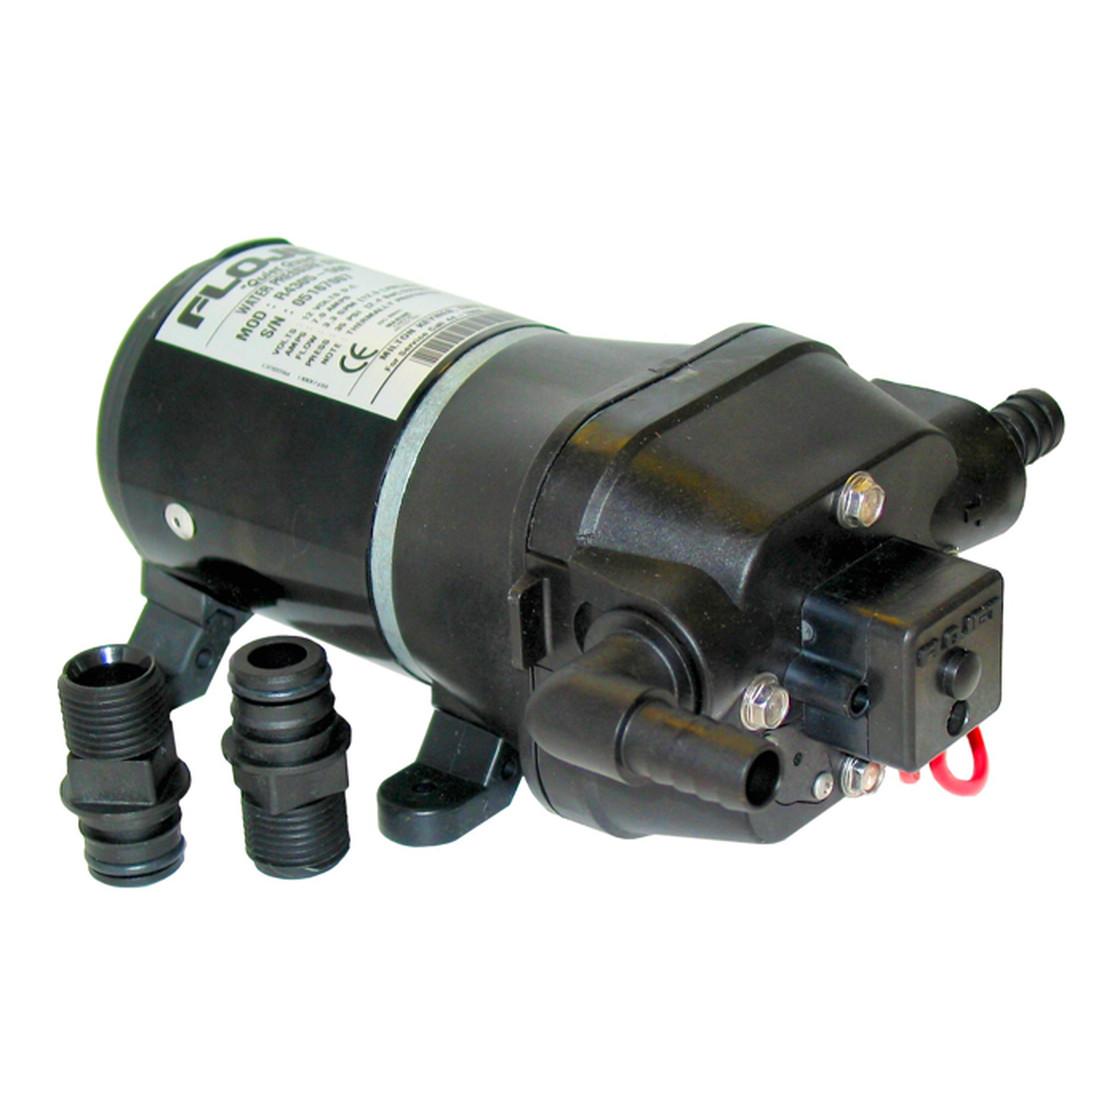 FLOJET 9-9 Membranpumpe Wasserpumpe Selbstansaugende Pumpe